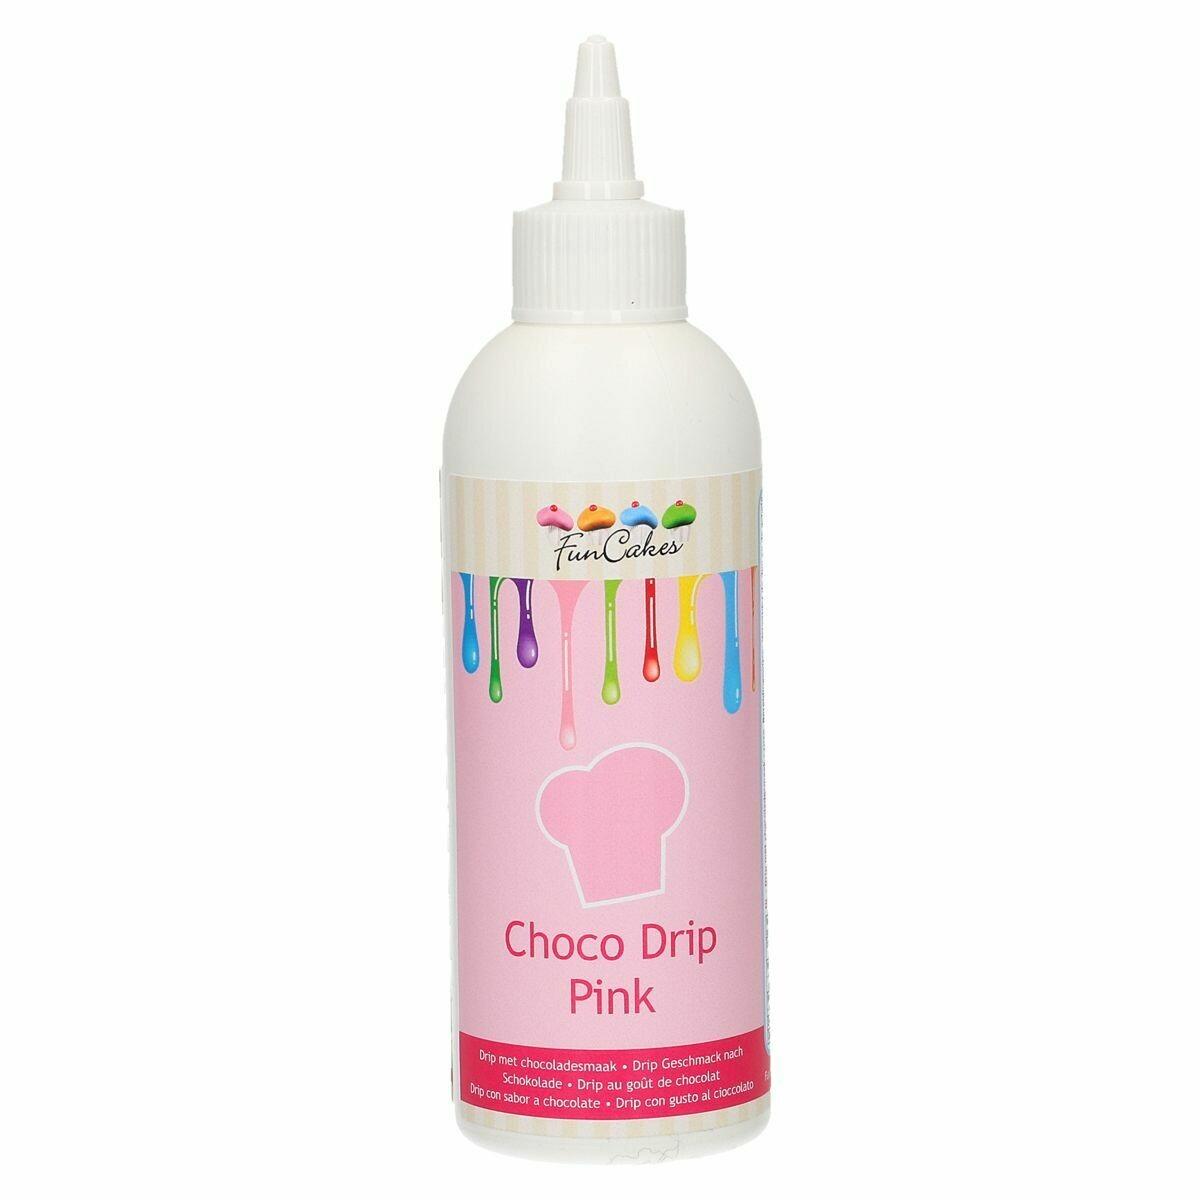 FunCakes Choco Drip -PINK 180g - Drip Σοκολάτας Ροζ